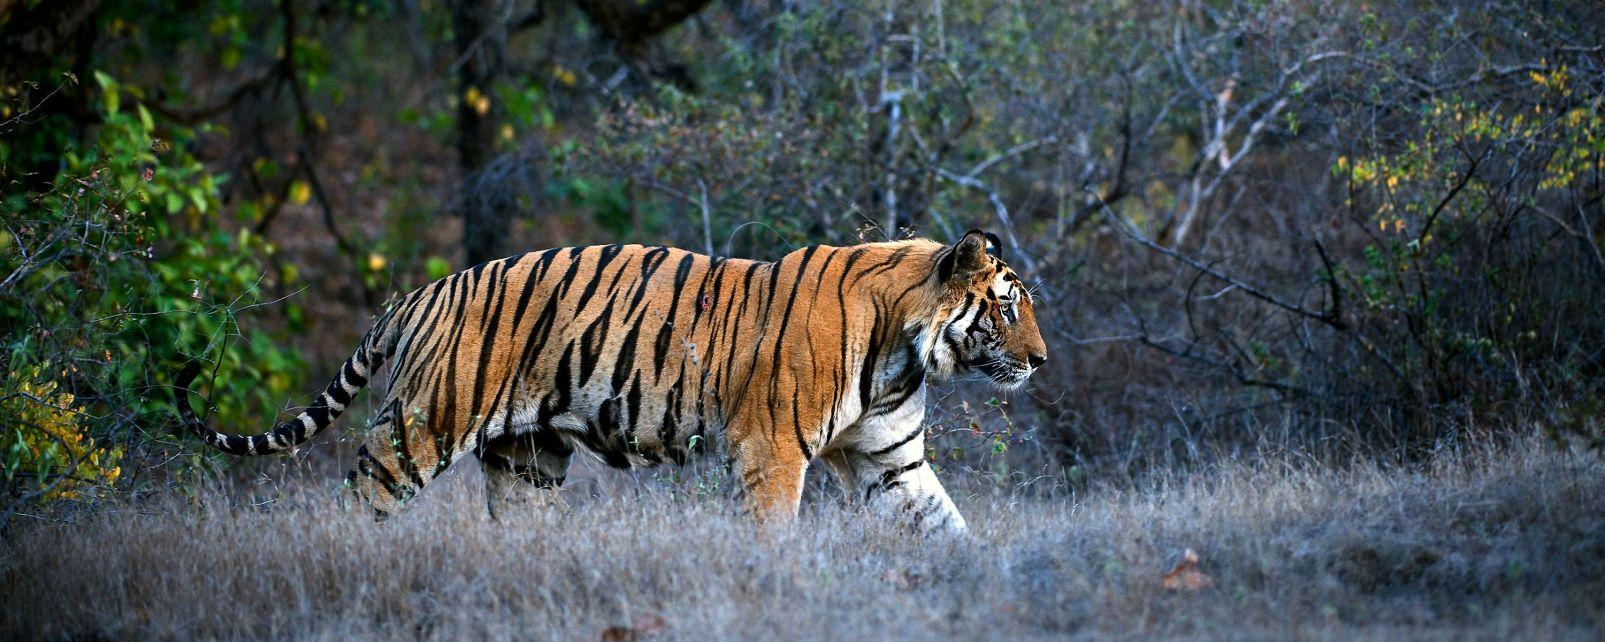 Wildlife, The fauna and flora, Myanmar